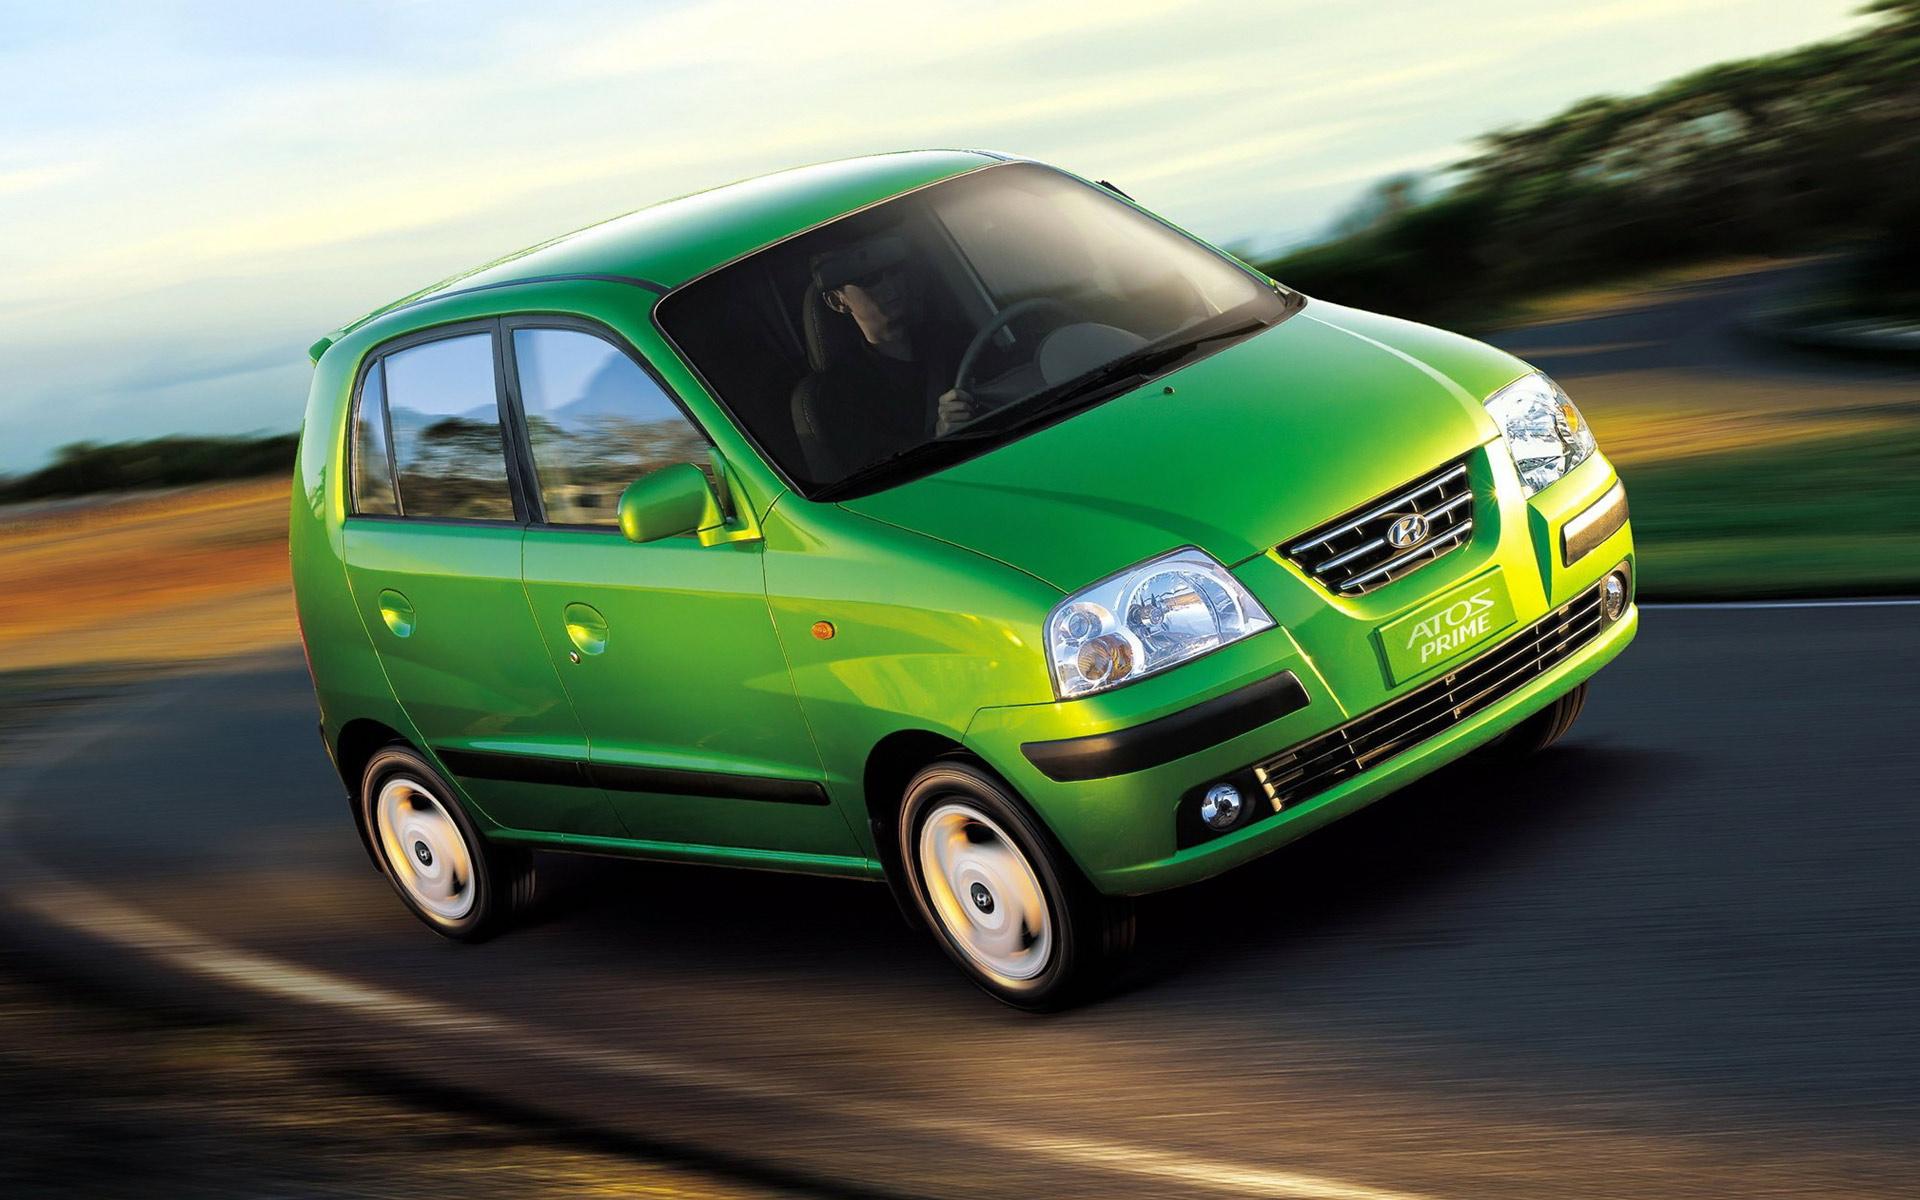 Hyundai Atos Prime Picture 8 Reviews News Specs Buy Car